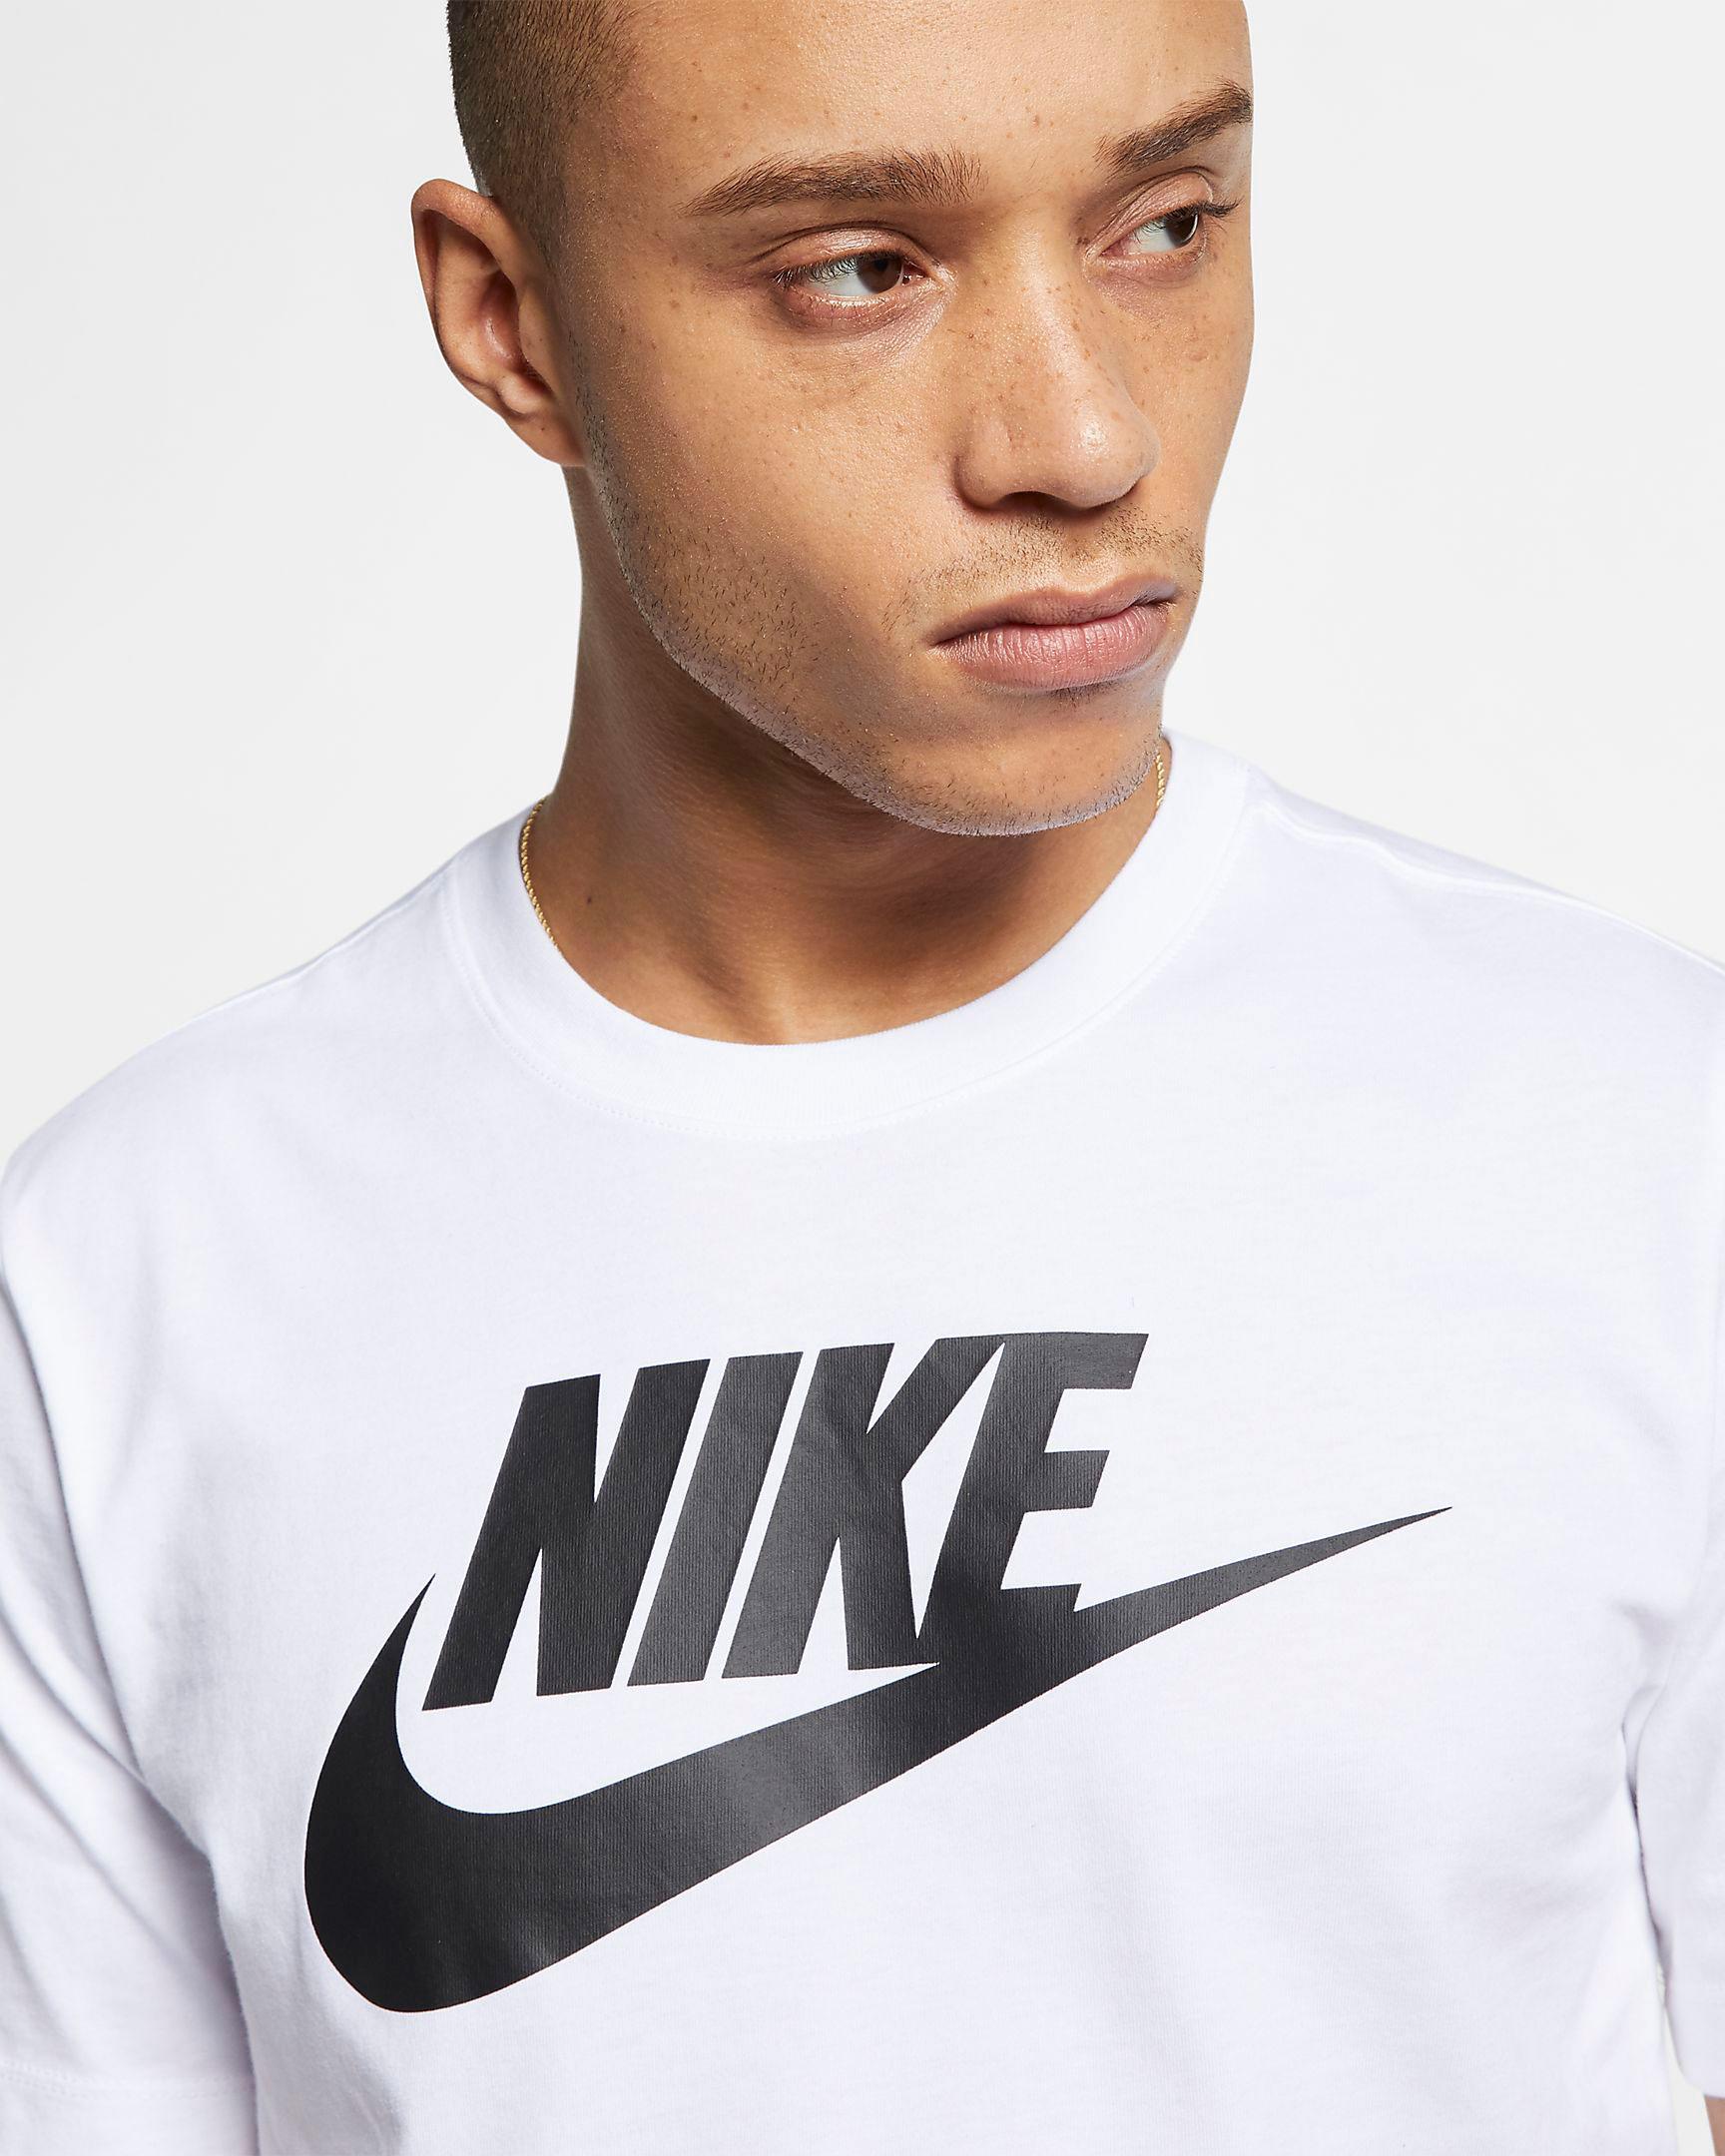 nike-futura-logo-shirt-white-black